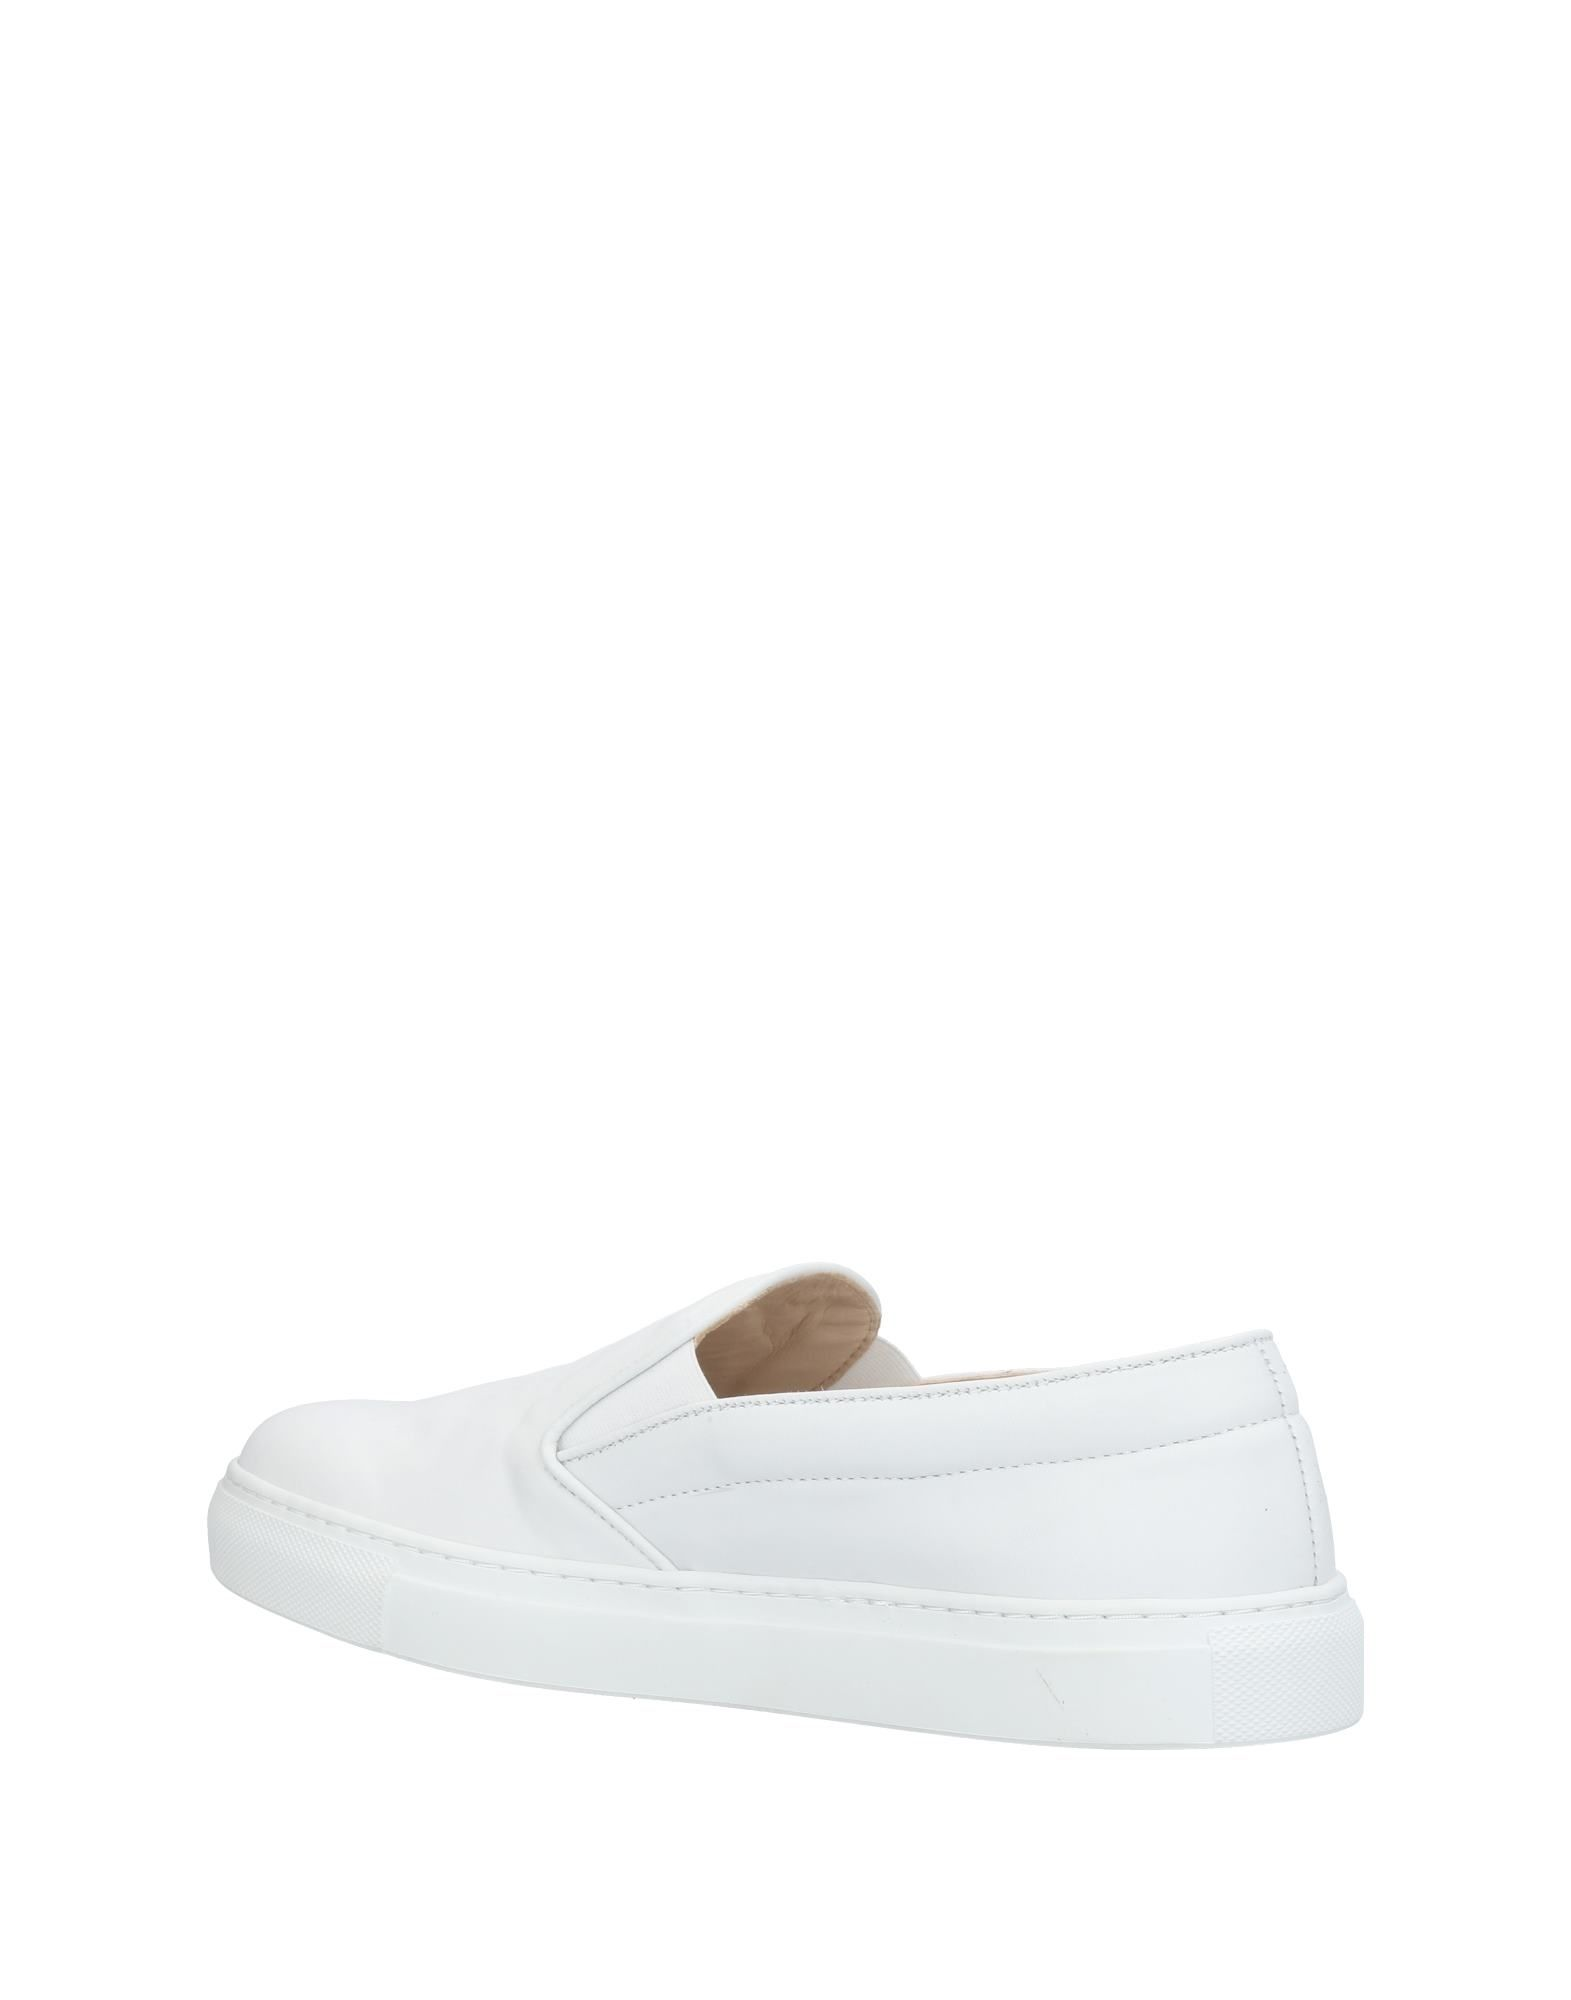 Pantofola D'oro Sneakers Herren  11456480RT Gute Qualität beliebte Schuhe